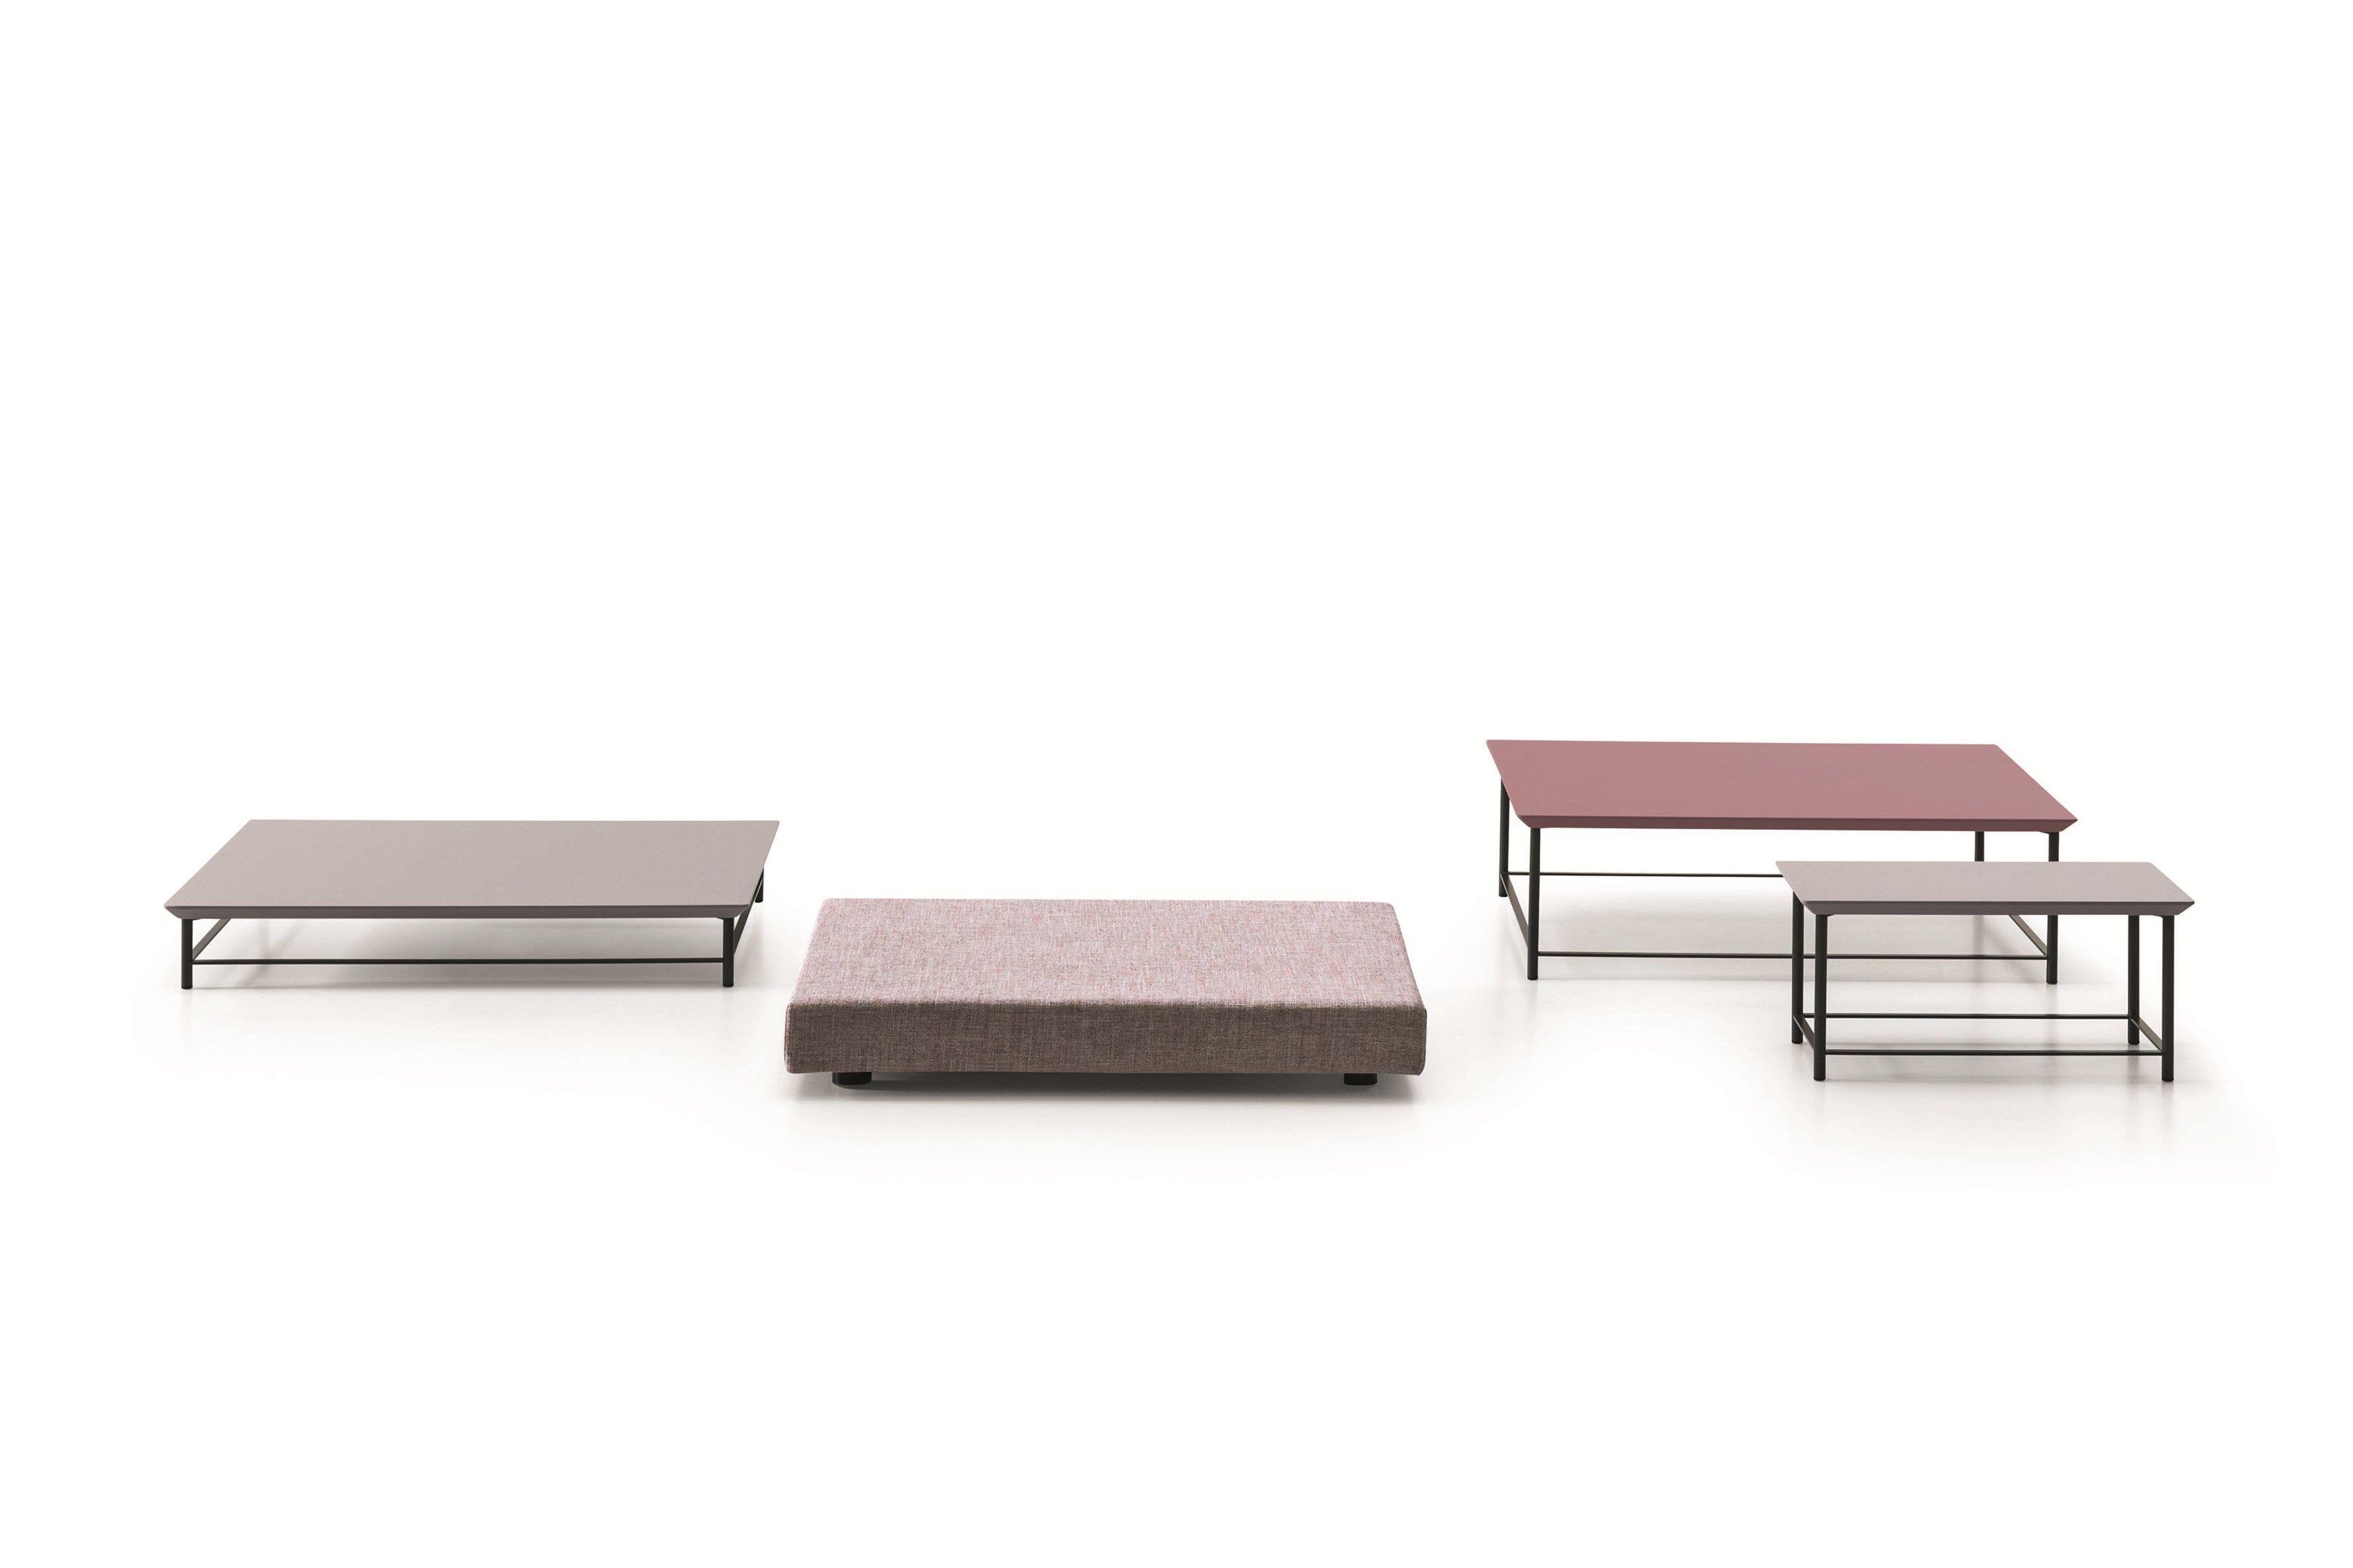 canap composable en tissu today by saba italia design stefano cavazzana. Black Bedroom Furniture Sets. Home Design Ideas